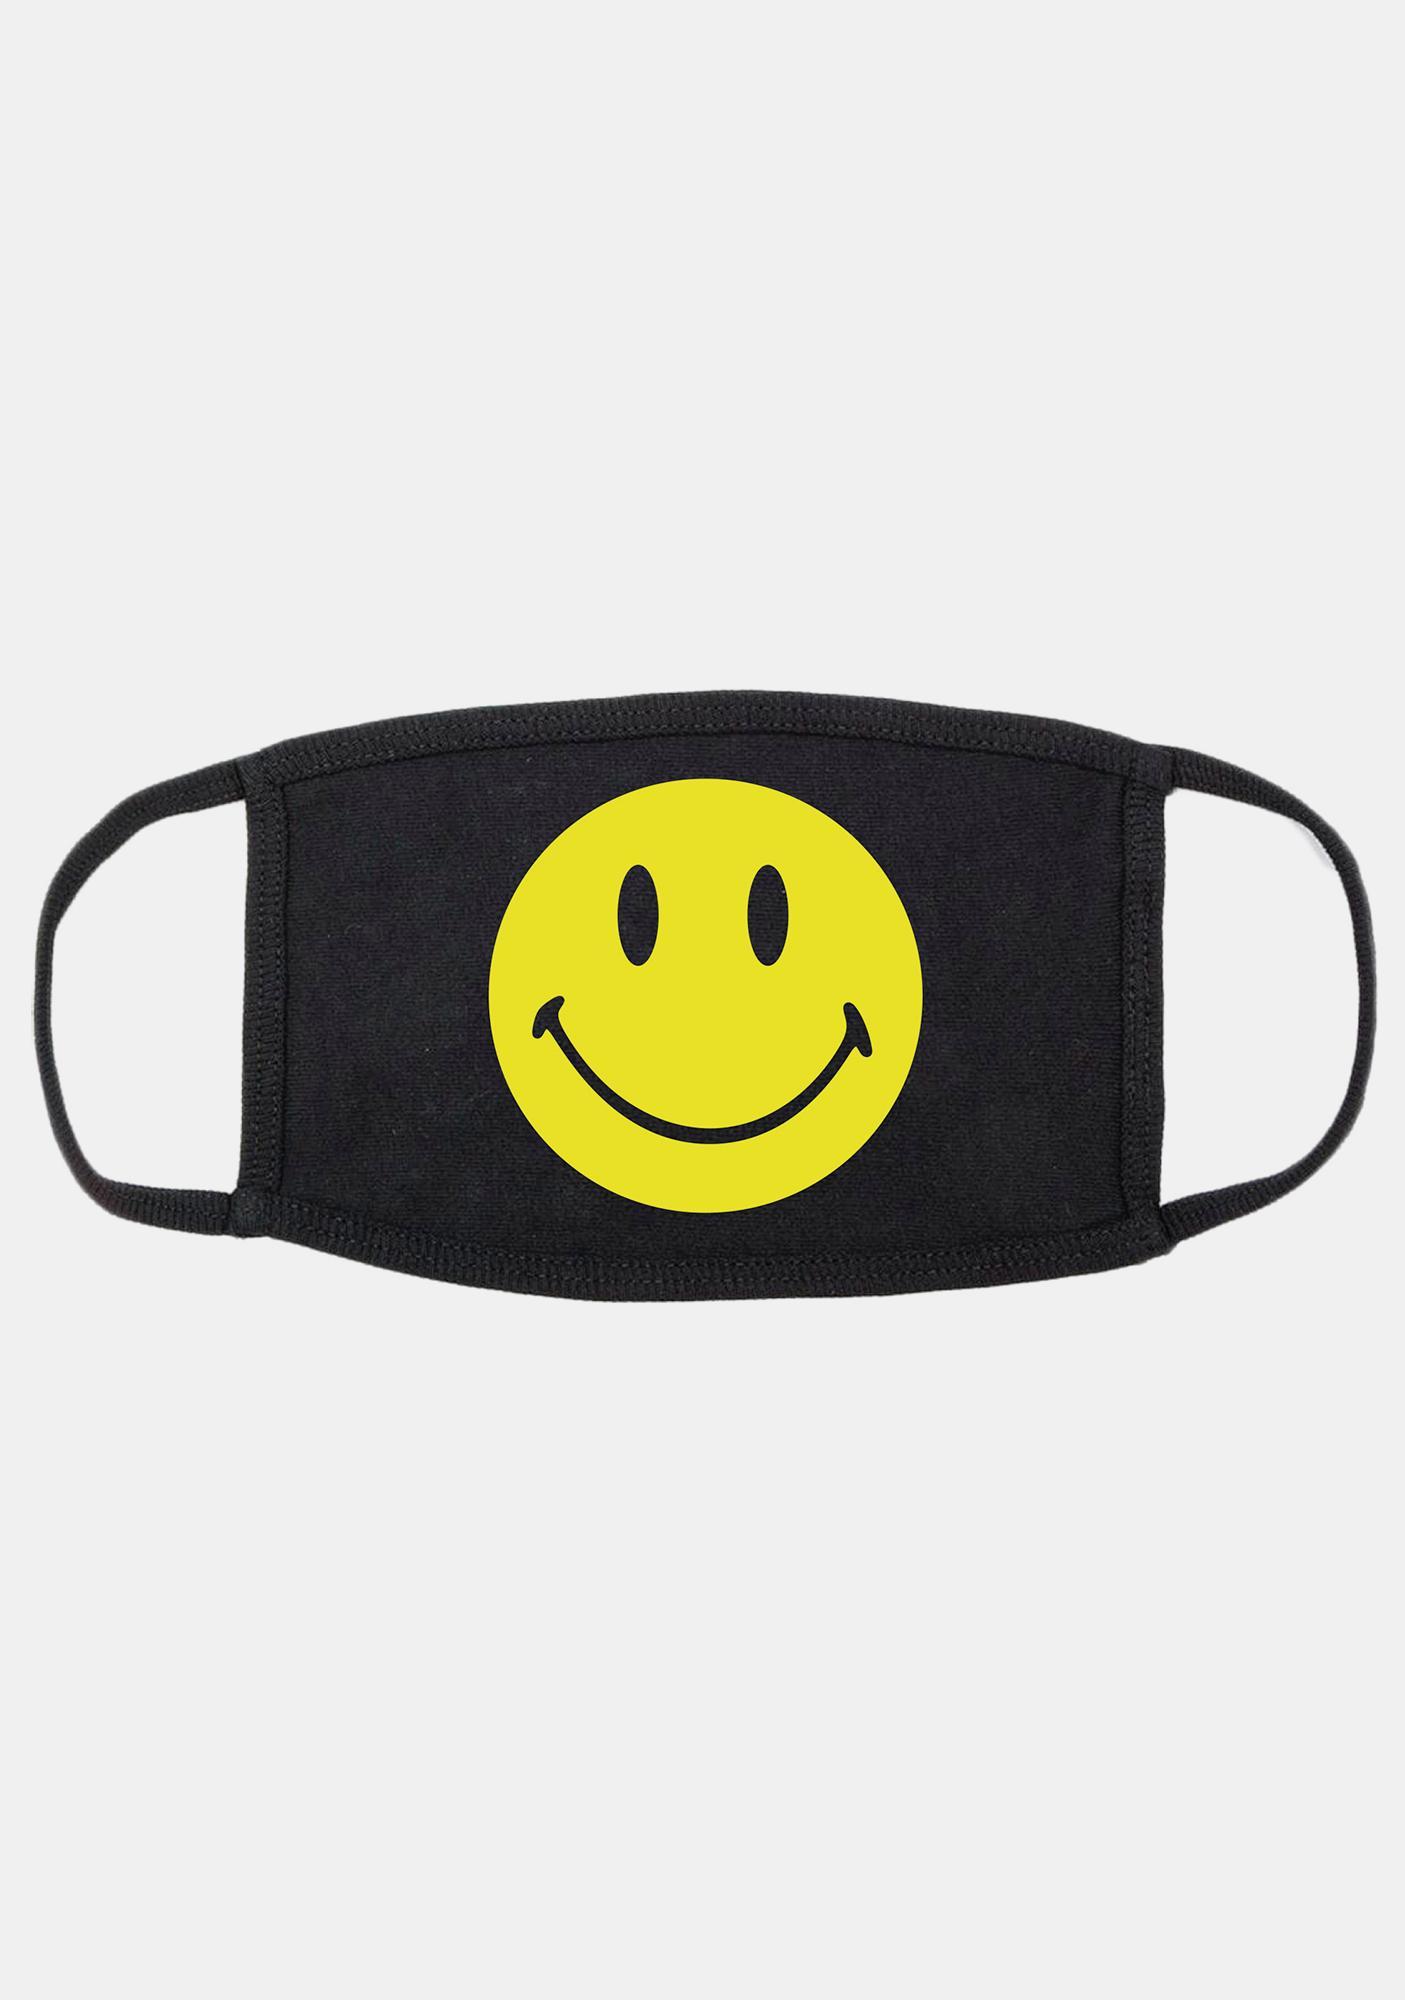 CHINATOWN MARKET Smiley Face Logo Mask